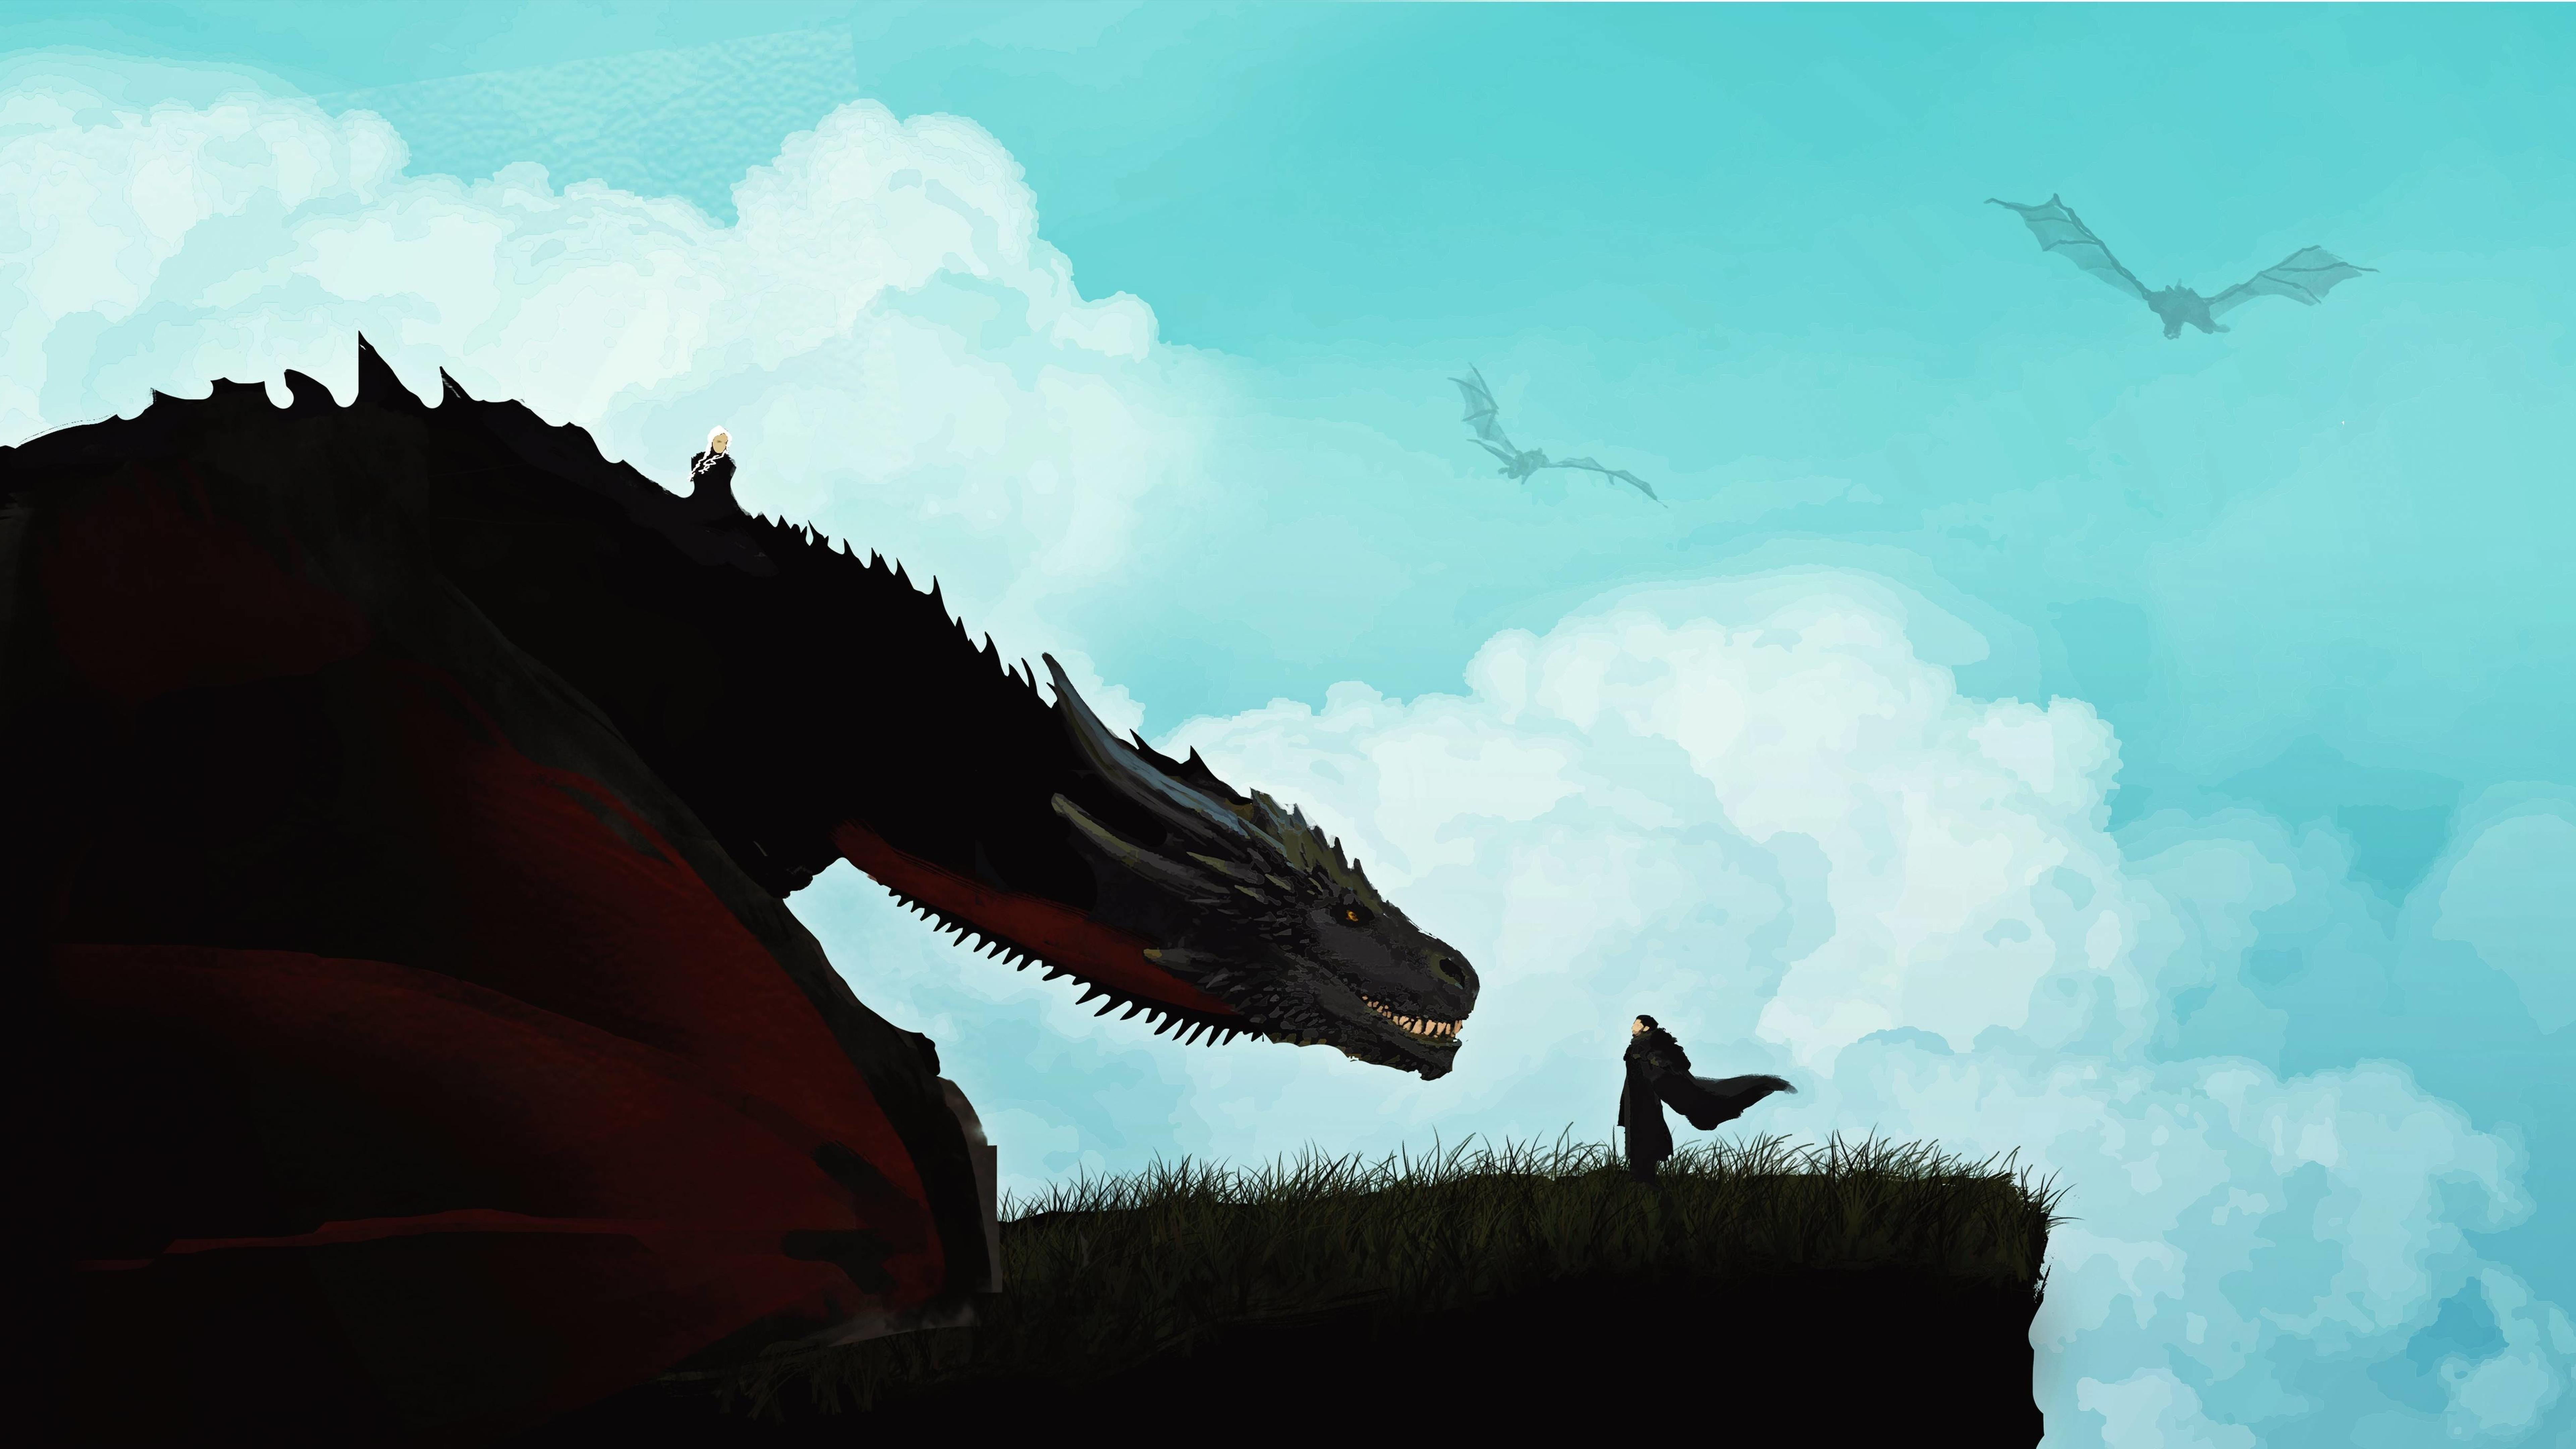 4k Game Of Thrones Wallpaper: Jon Snow Meets The Dragon Minimal, HD 4K Wallpaper